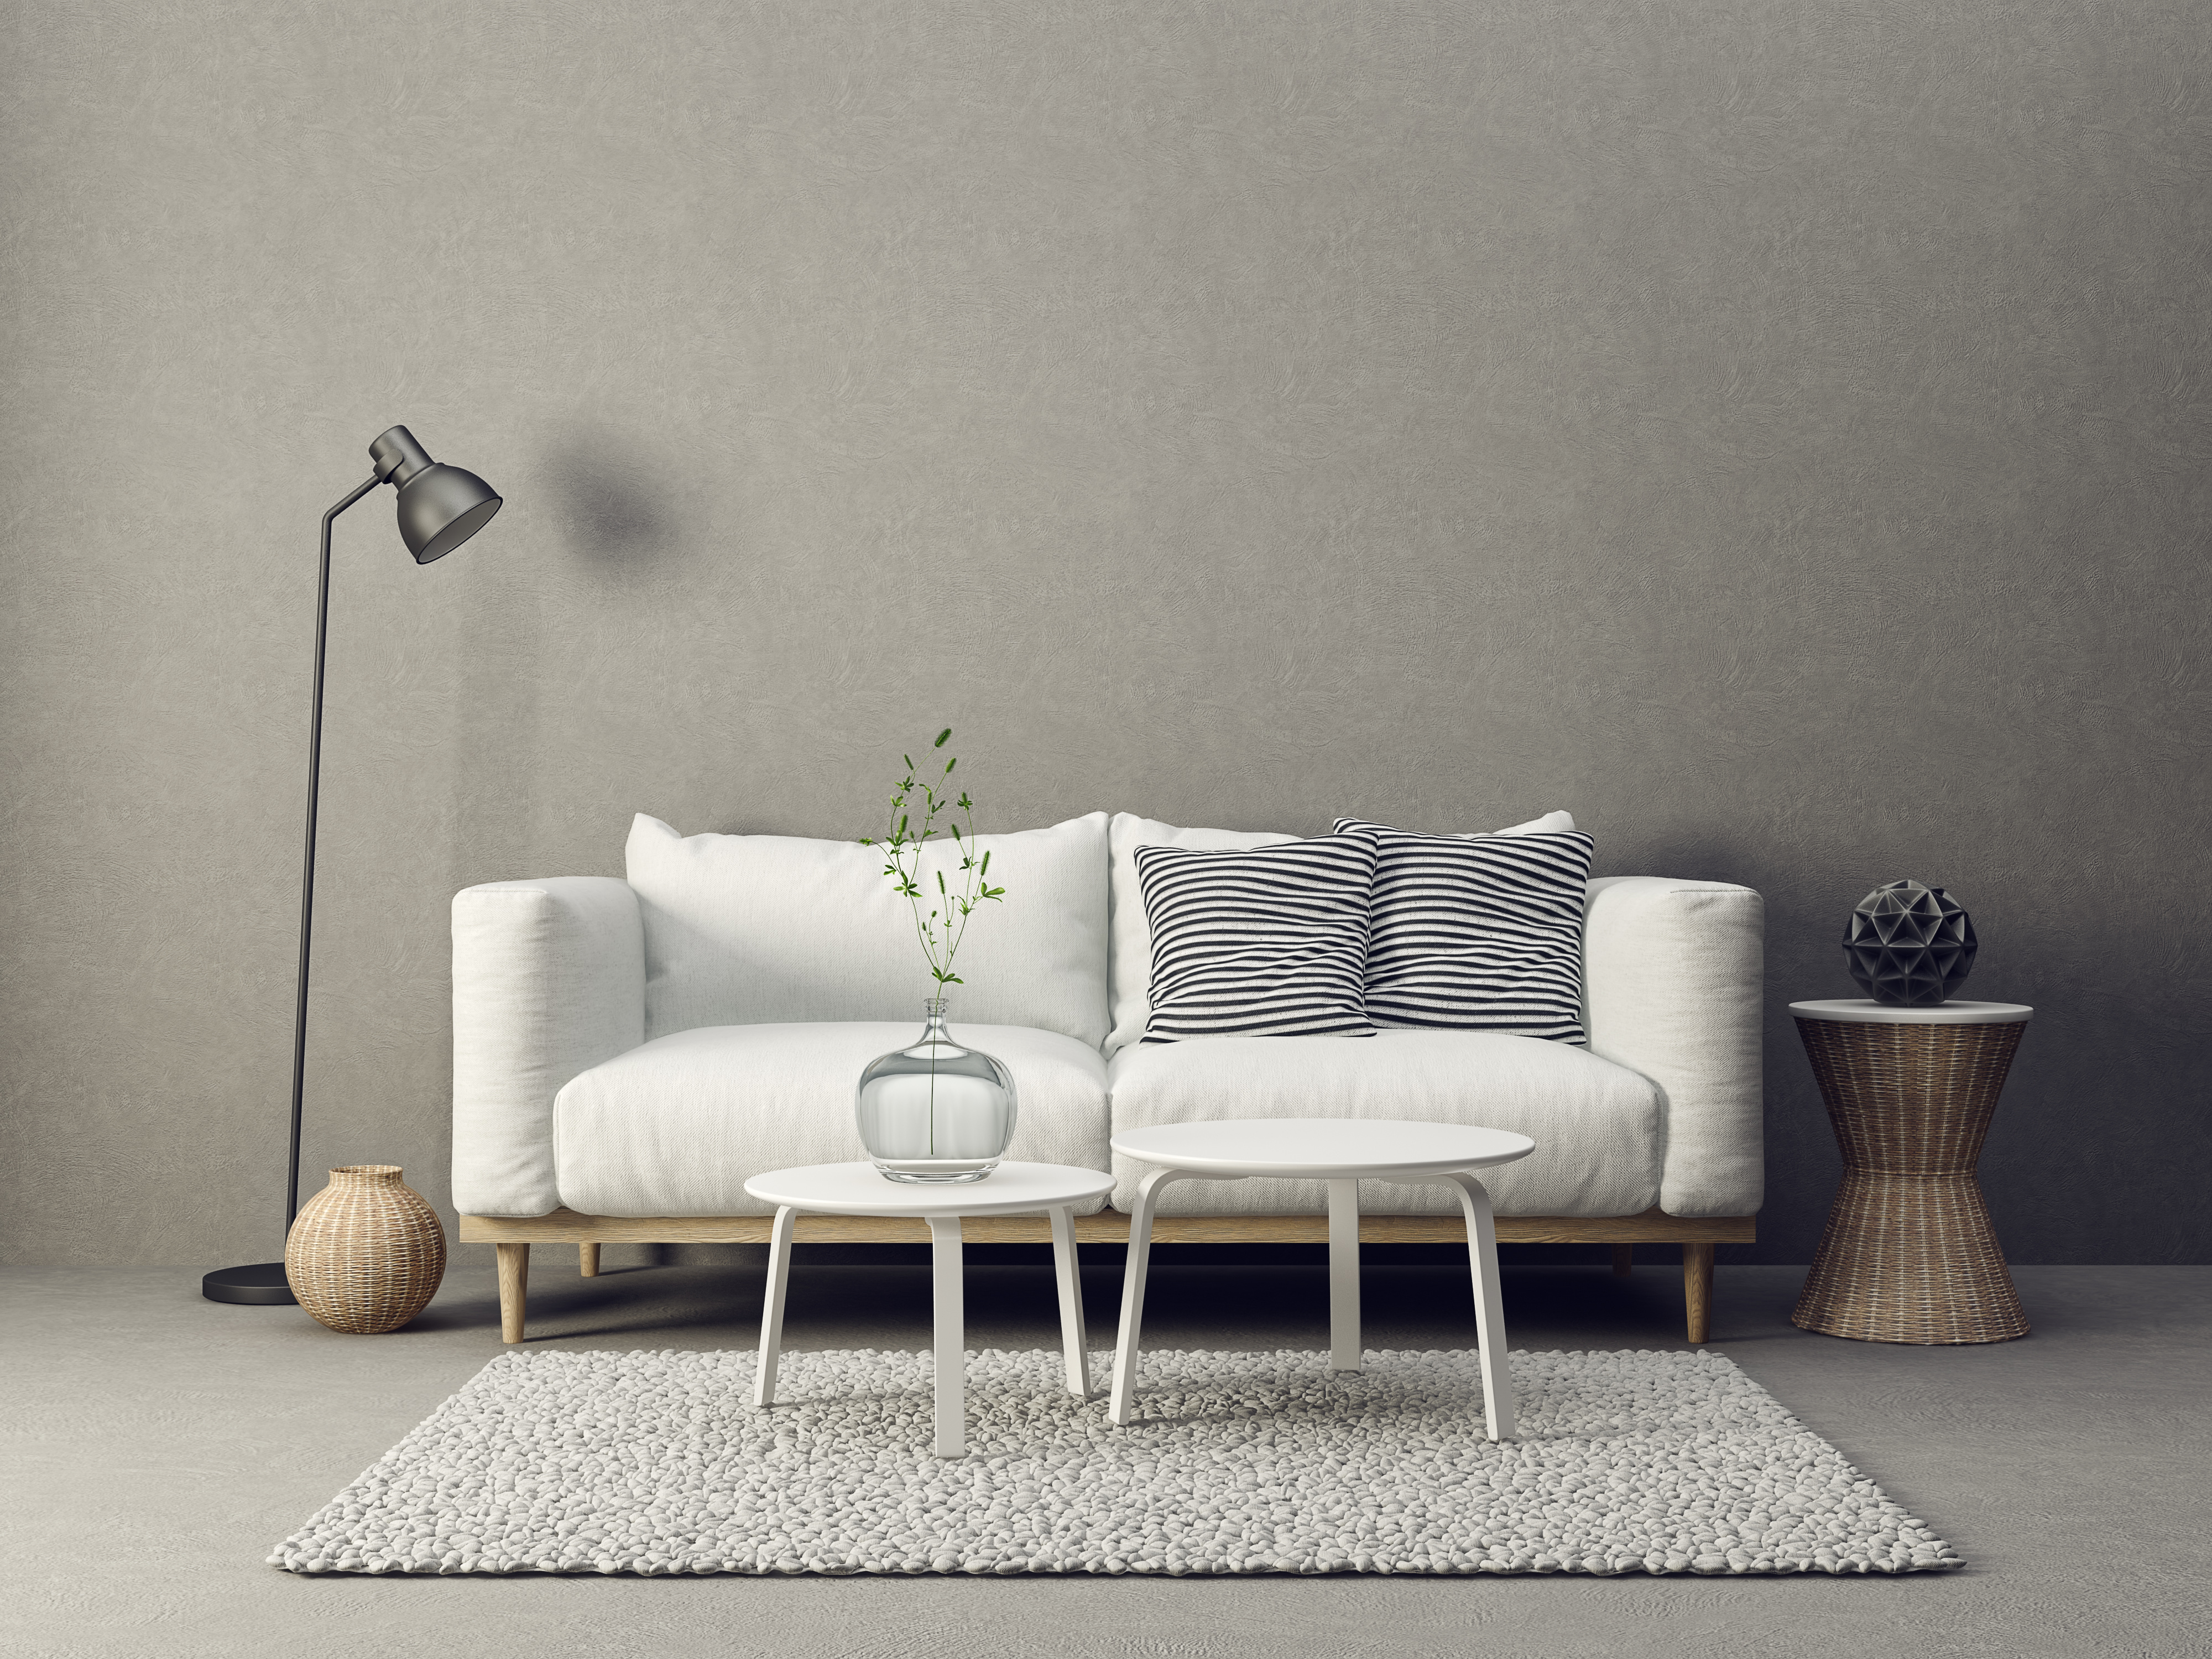 modern living room interior with furniture. 3d illustration